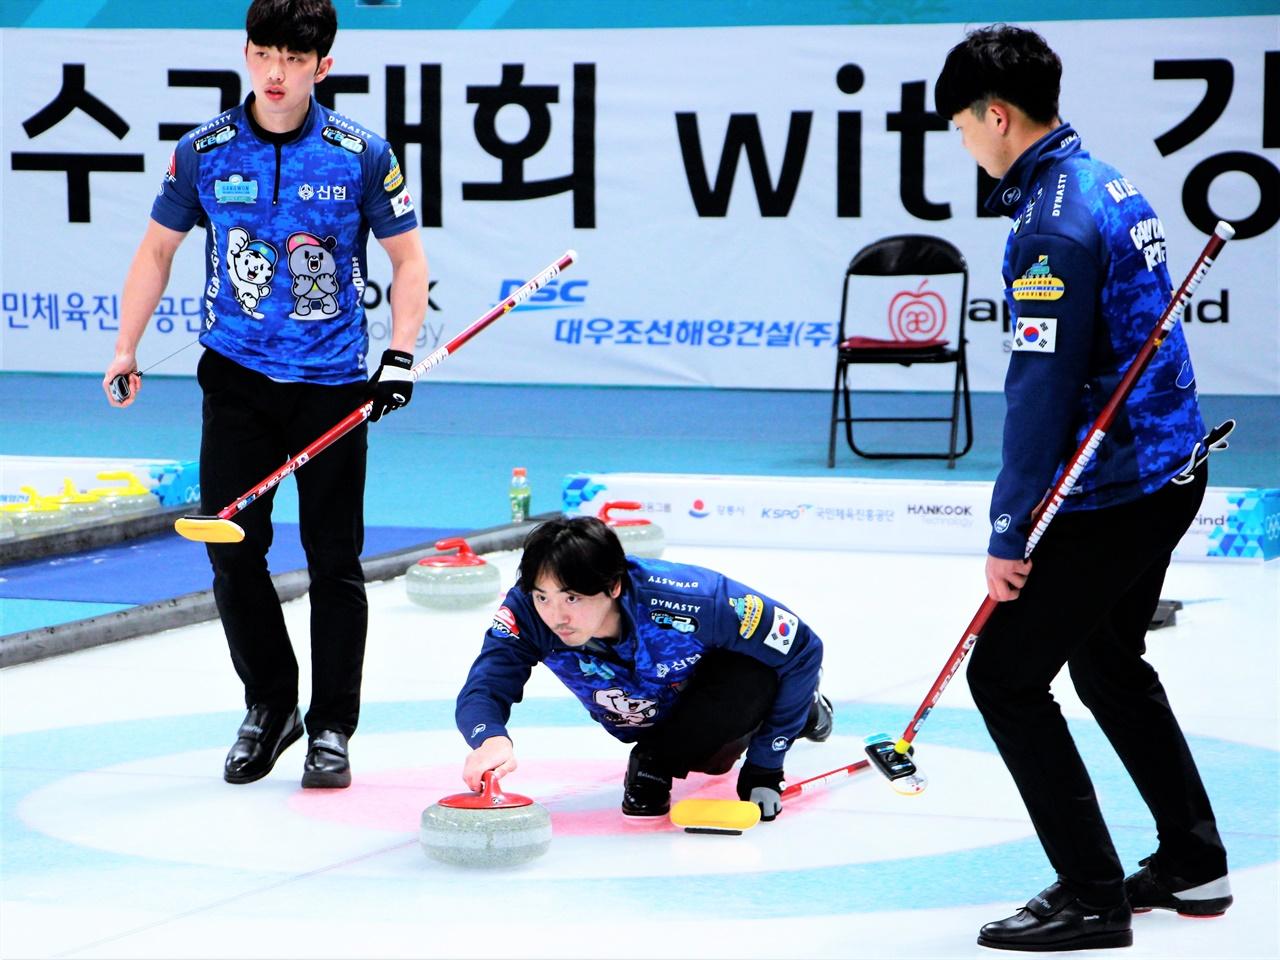 2021 KB금융 한국컬링선수권대회 2차 라운드에서 강원도청 박종덕 스킵이 스톤을 투구하고 있다.